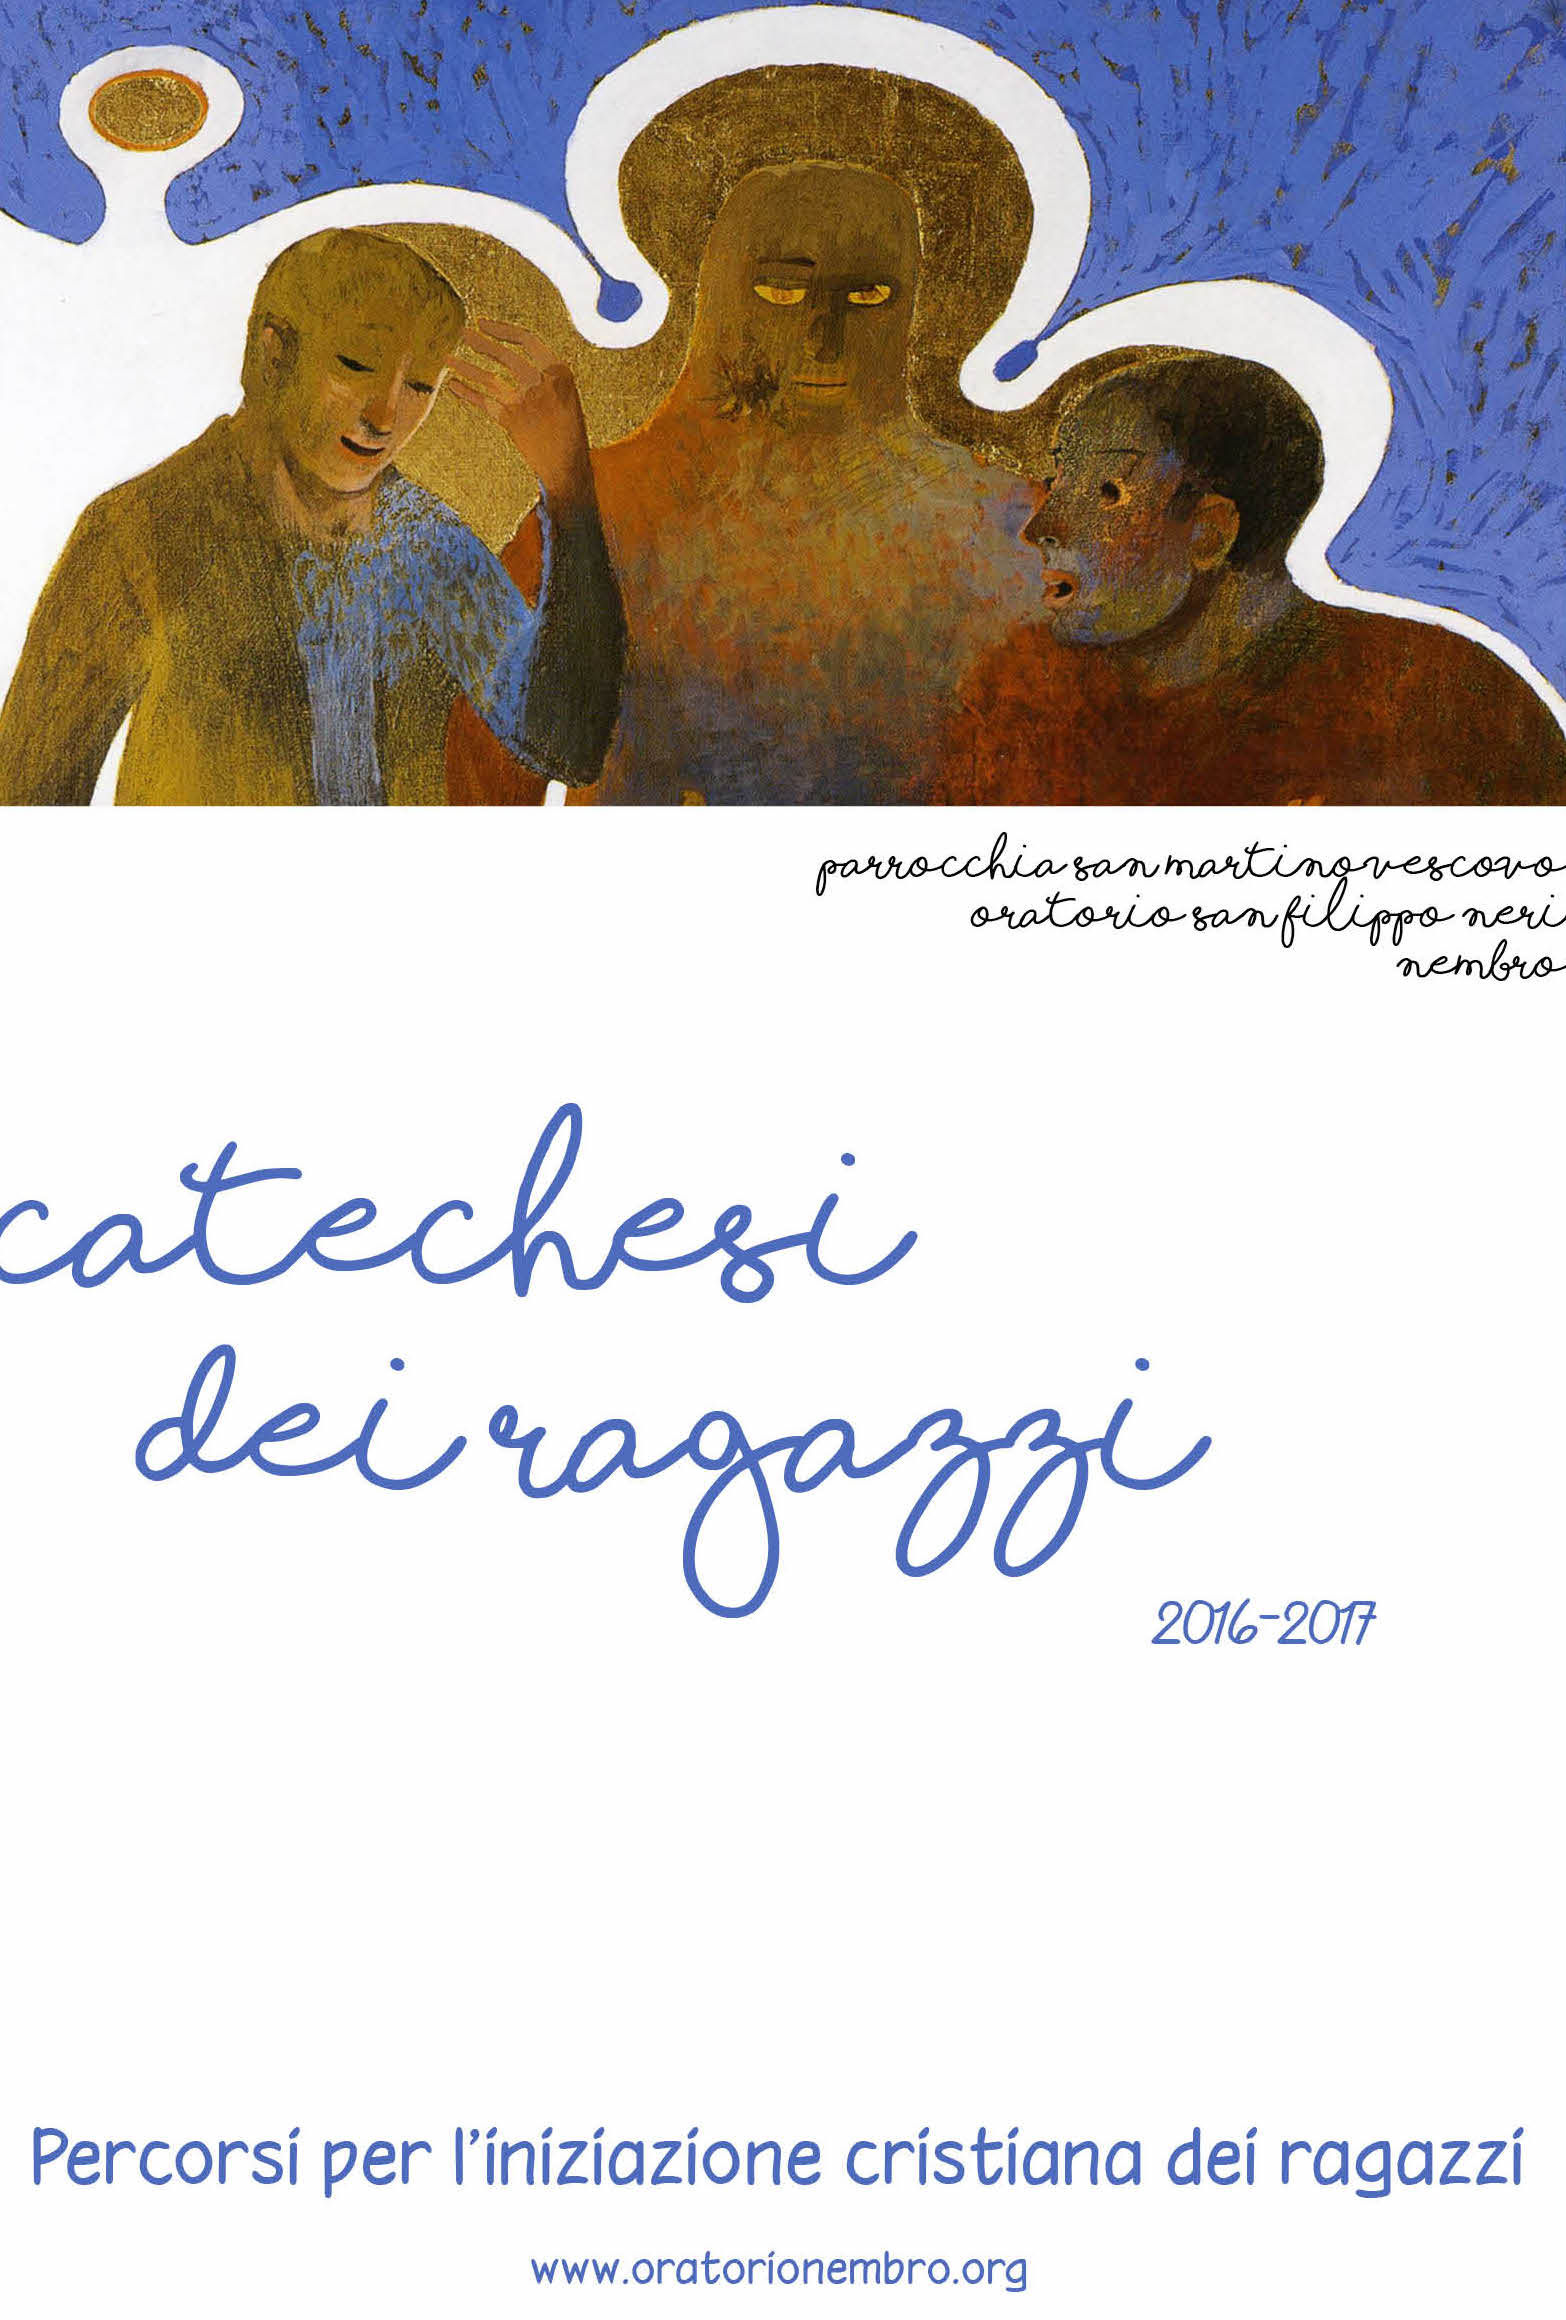 Vademecum Catechesi 2016/17